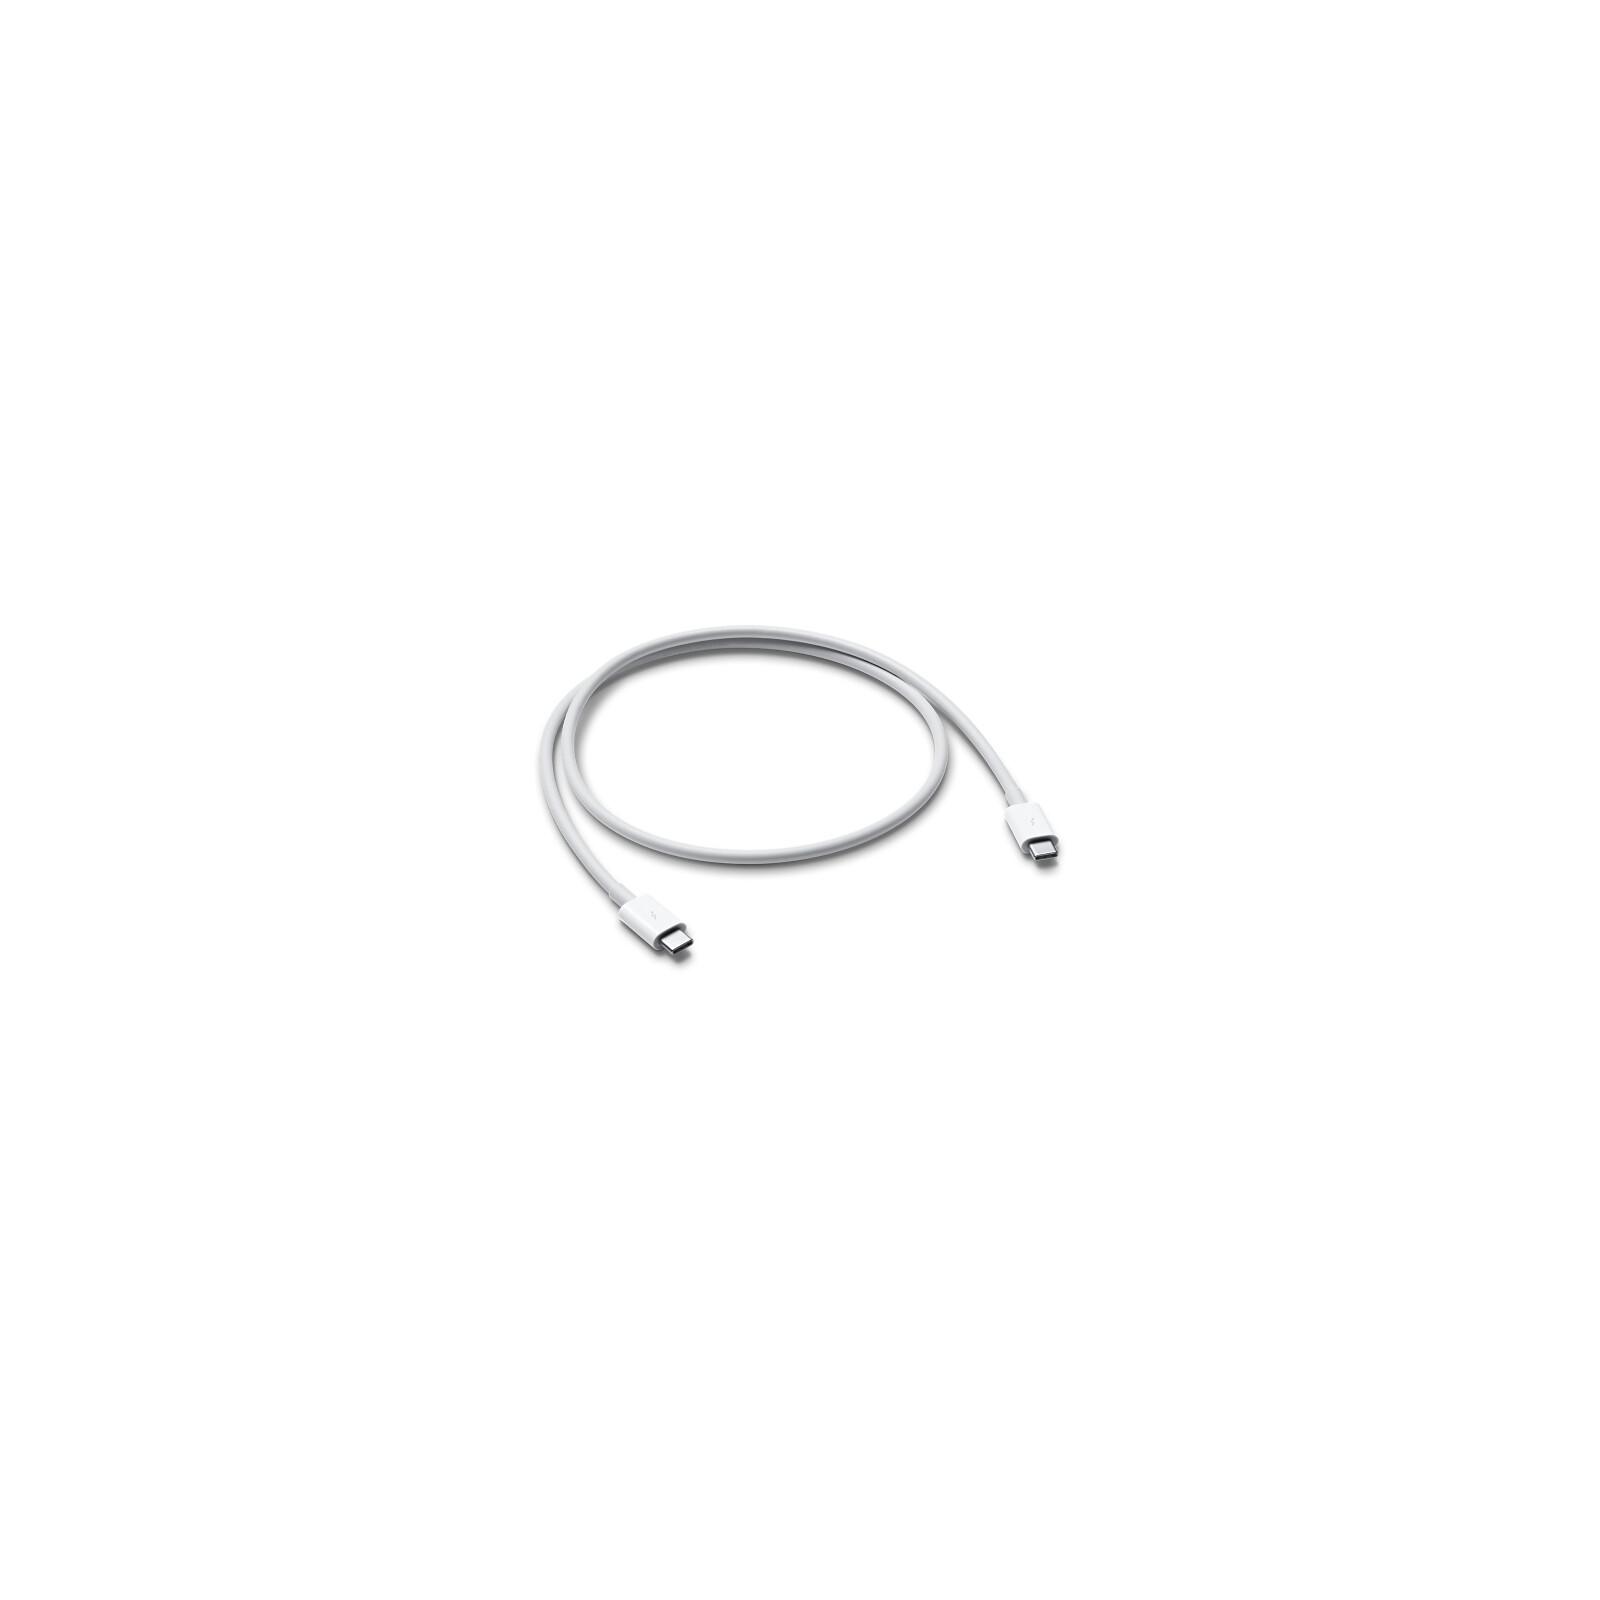 Apple Thunderbolt 3 USB-C Kabel 0,8m